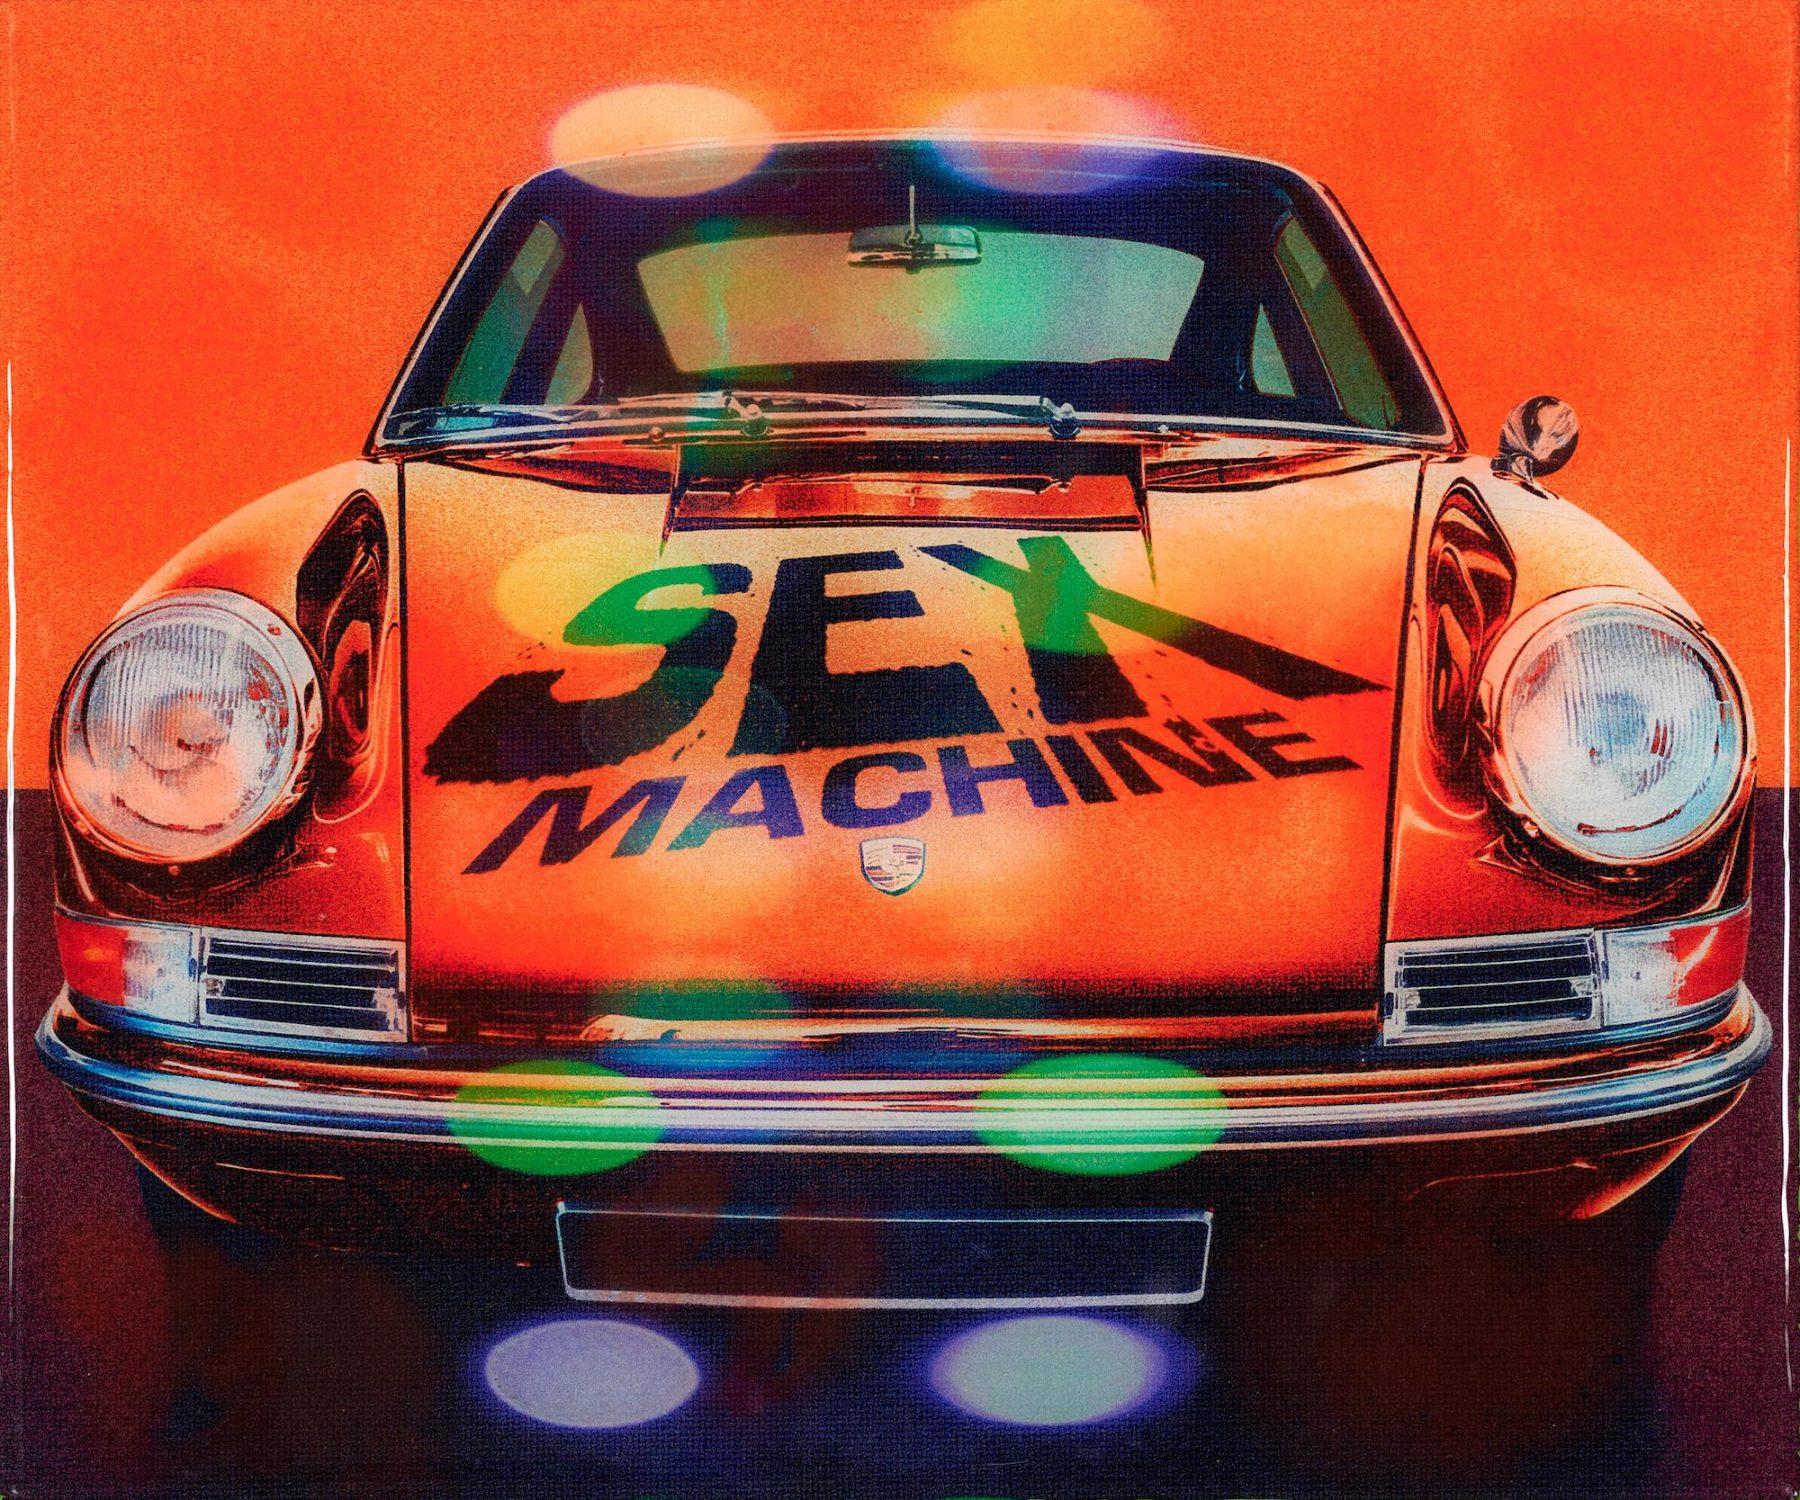 Sex machine - Döring, Jörg - k-DCLT21145F